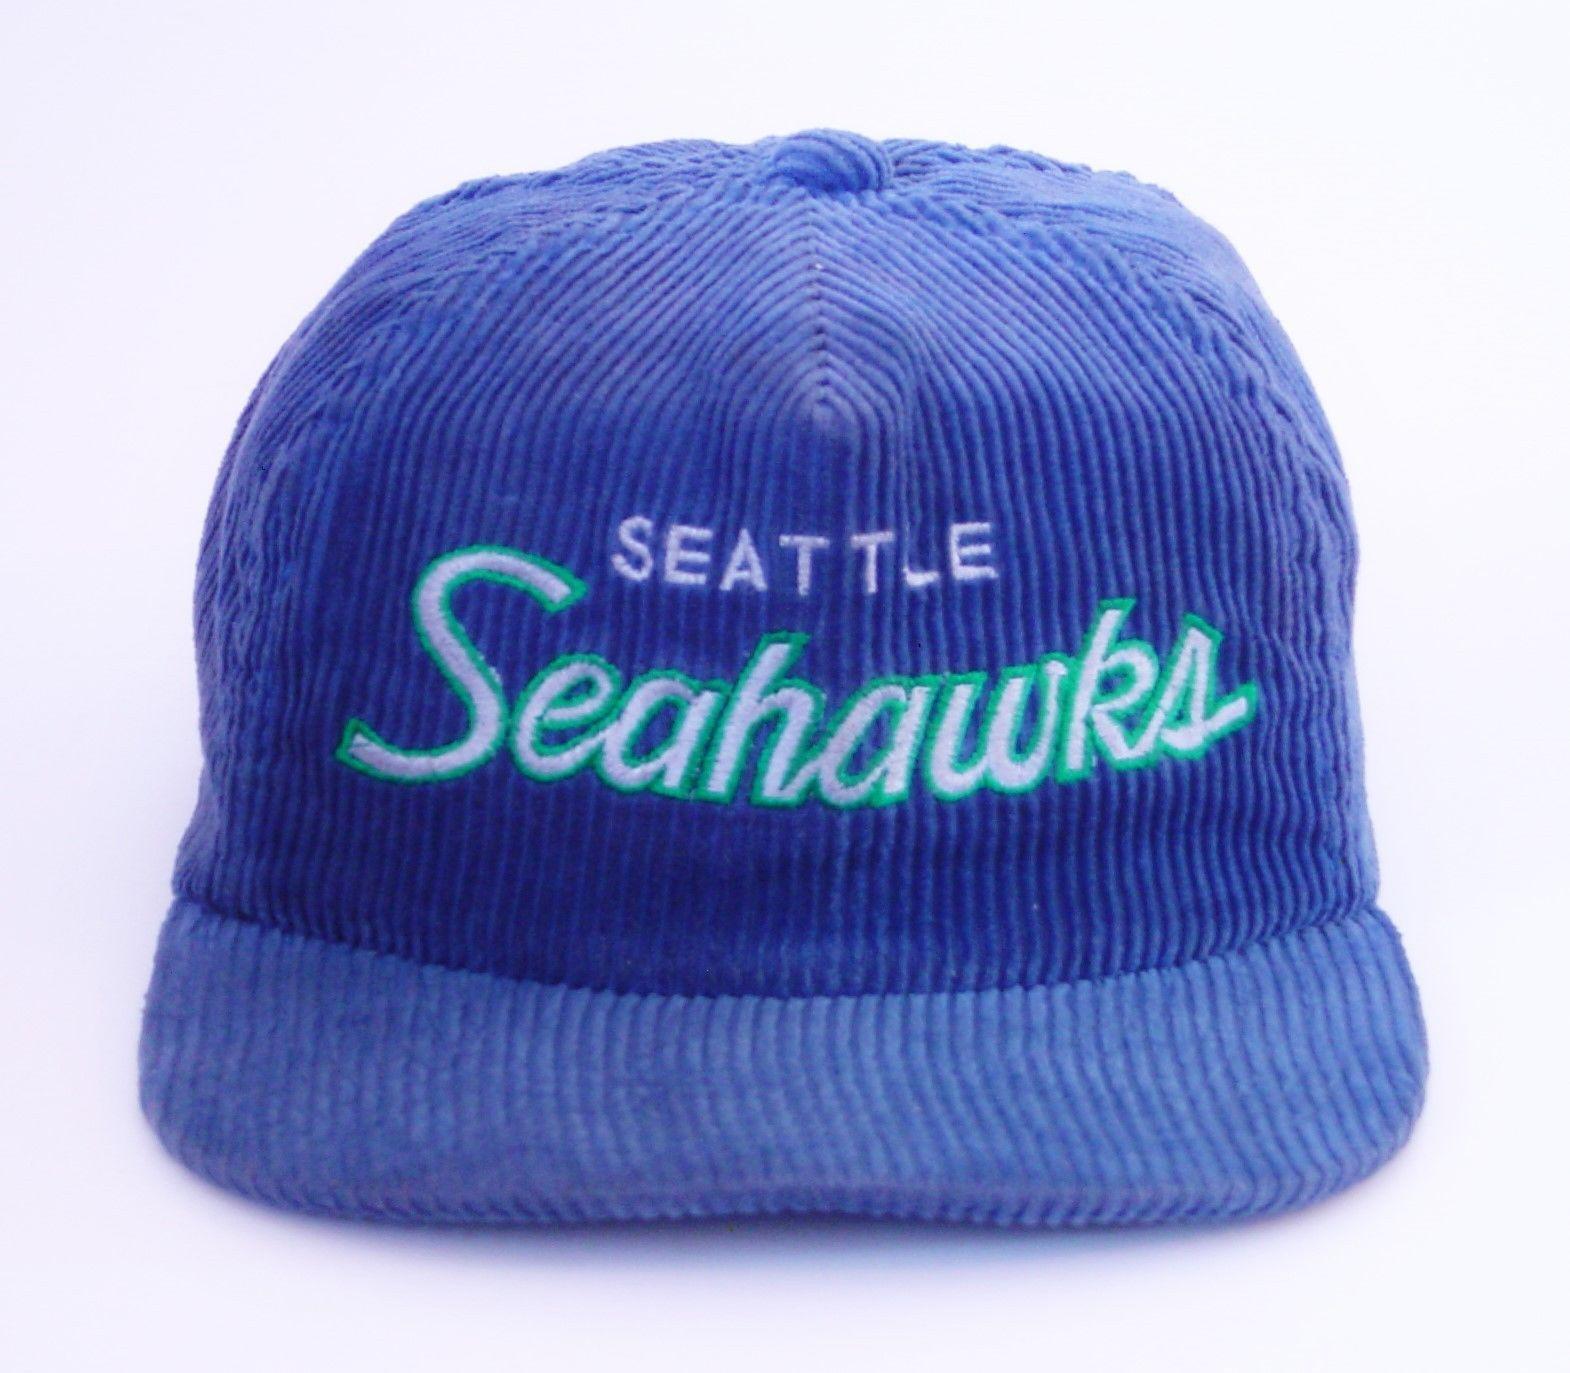 Vintage Sports Specialties Seattle Seahawks Script Corduroy Zipback Hat Cap   2c0cf0713d15